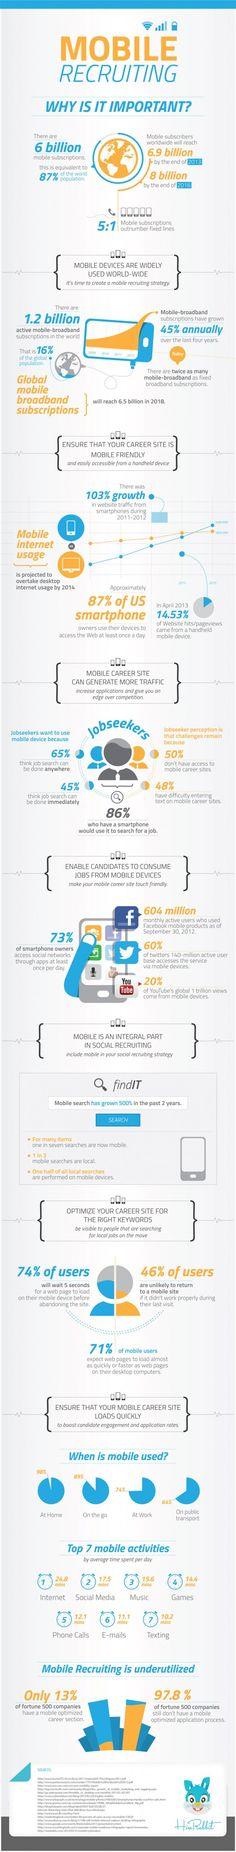 Infografik: Warum Mobile Recruiting so wichtig ist